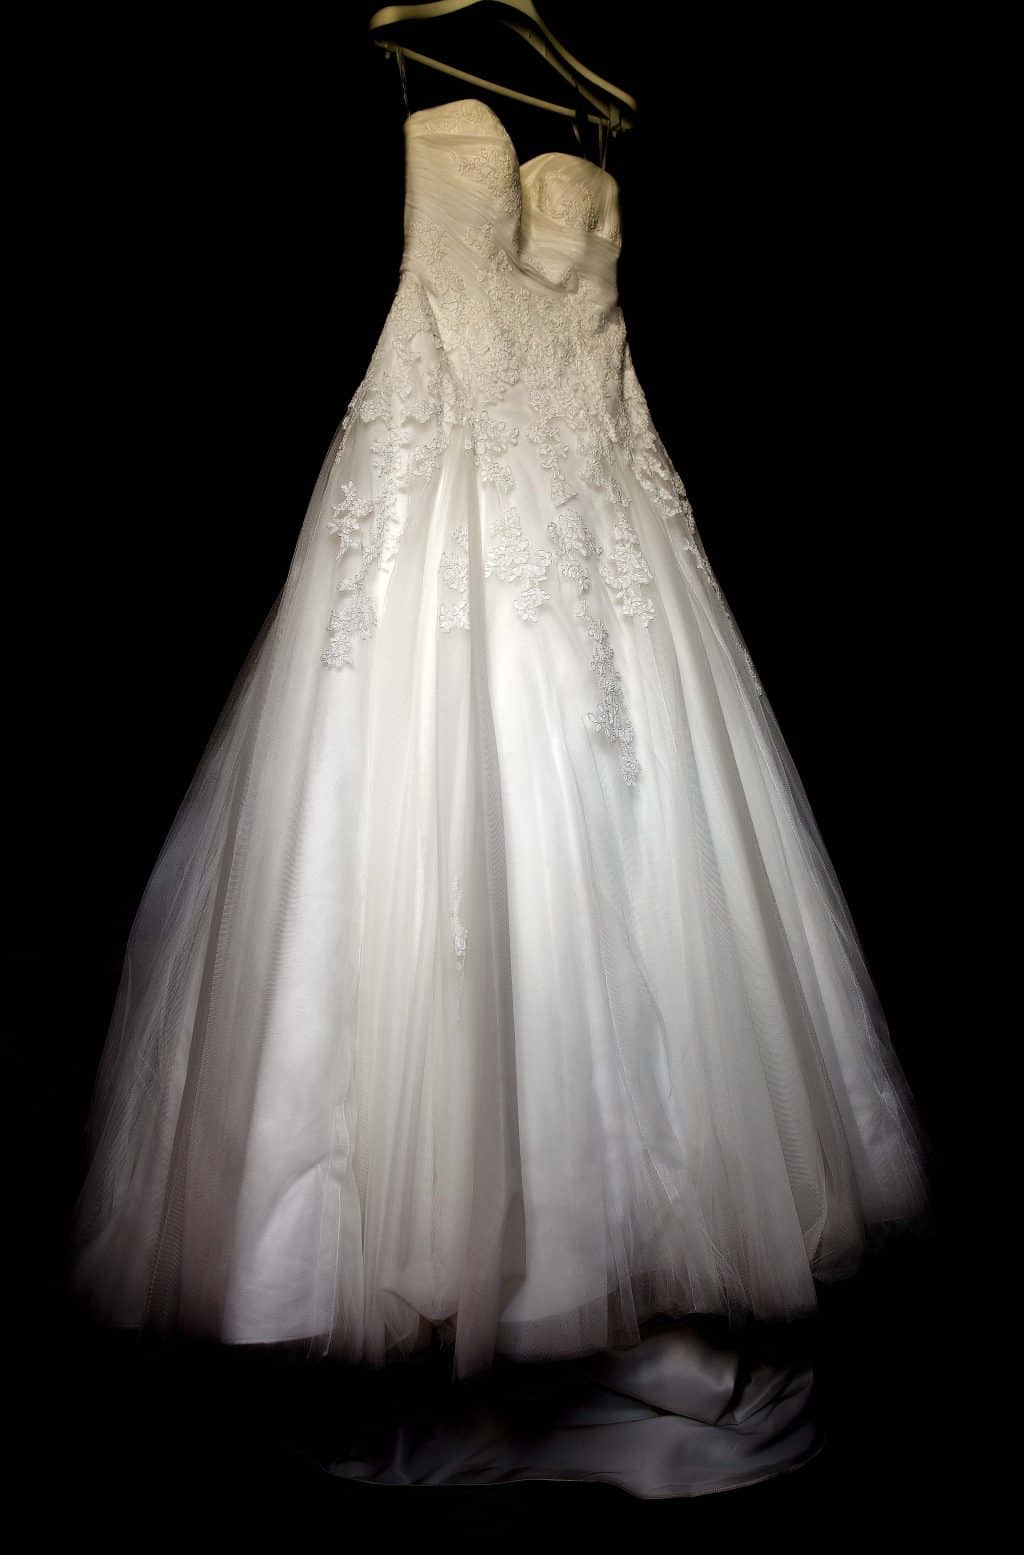 phorographie de la robe de la mariée